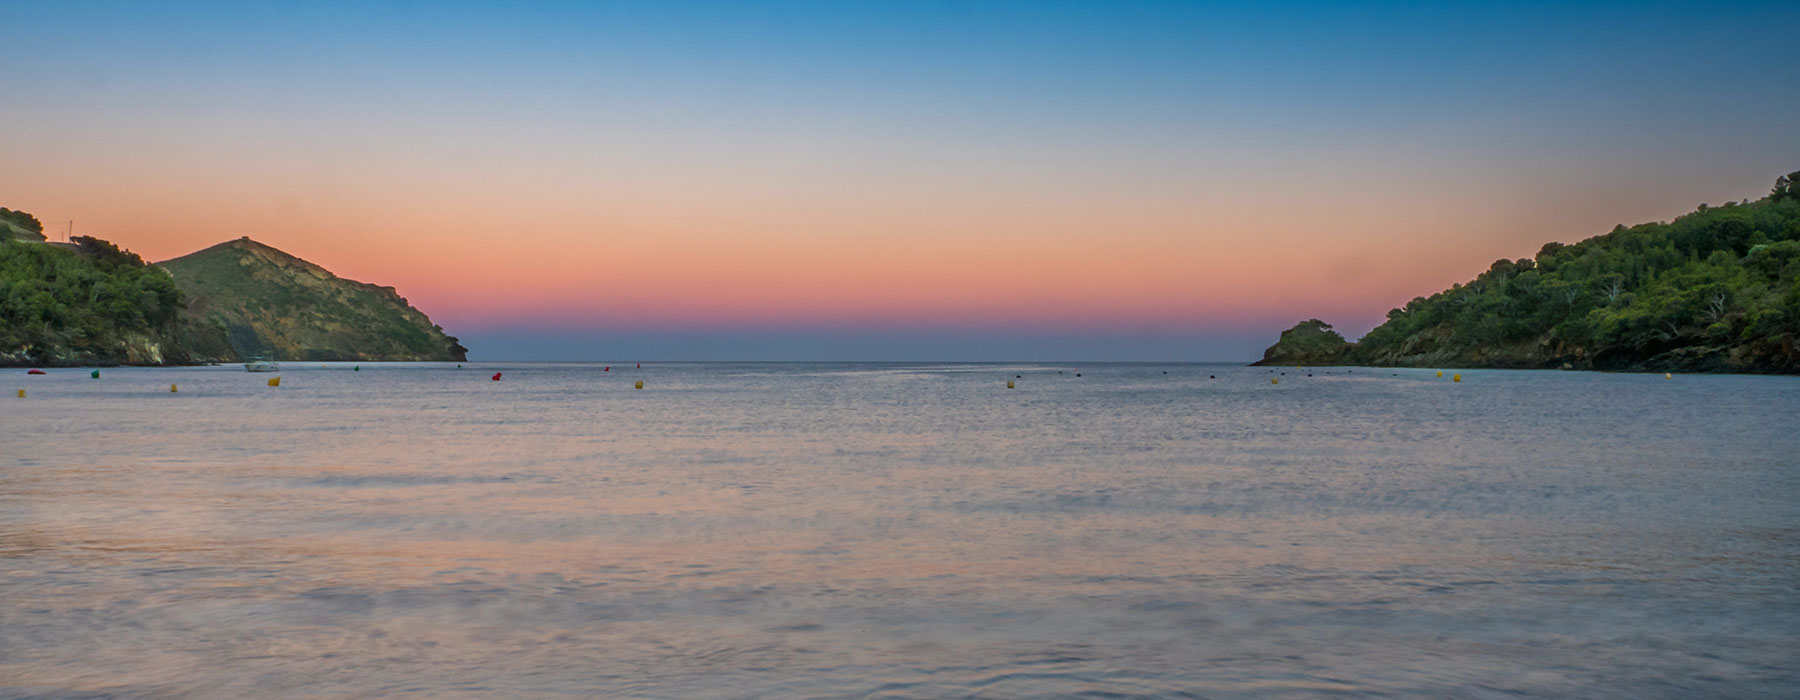 cala-montjoi-salida-puesta-sol-banner-home